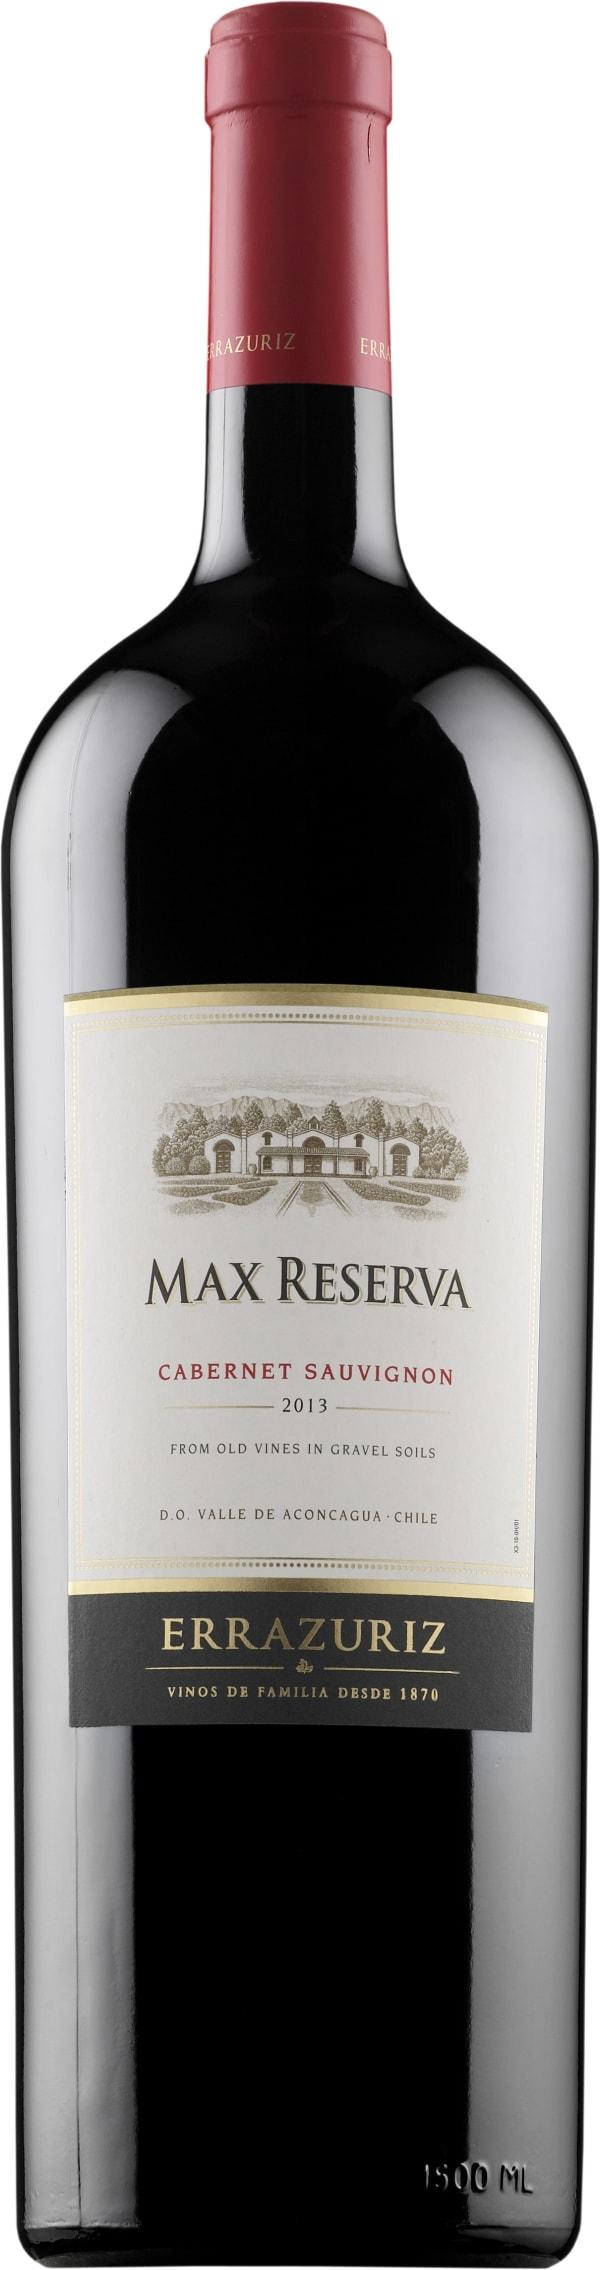 Errázuriz Max Reserva Cabernet Sauvignon 2014